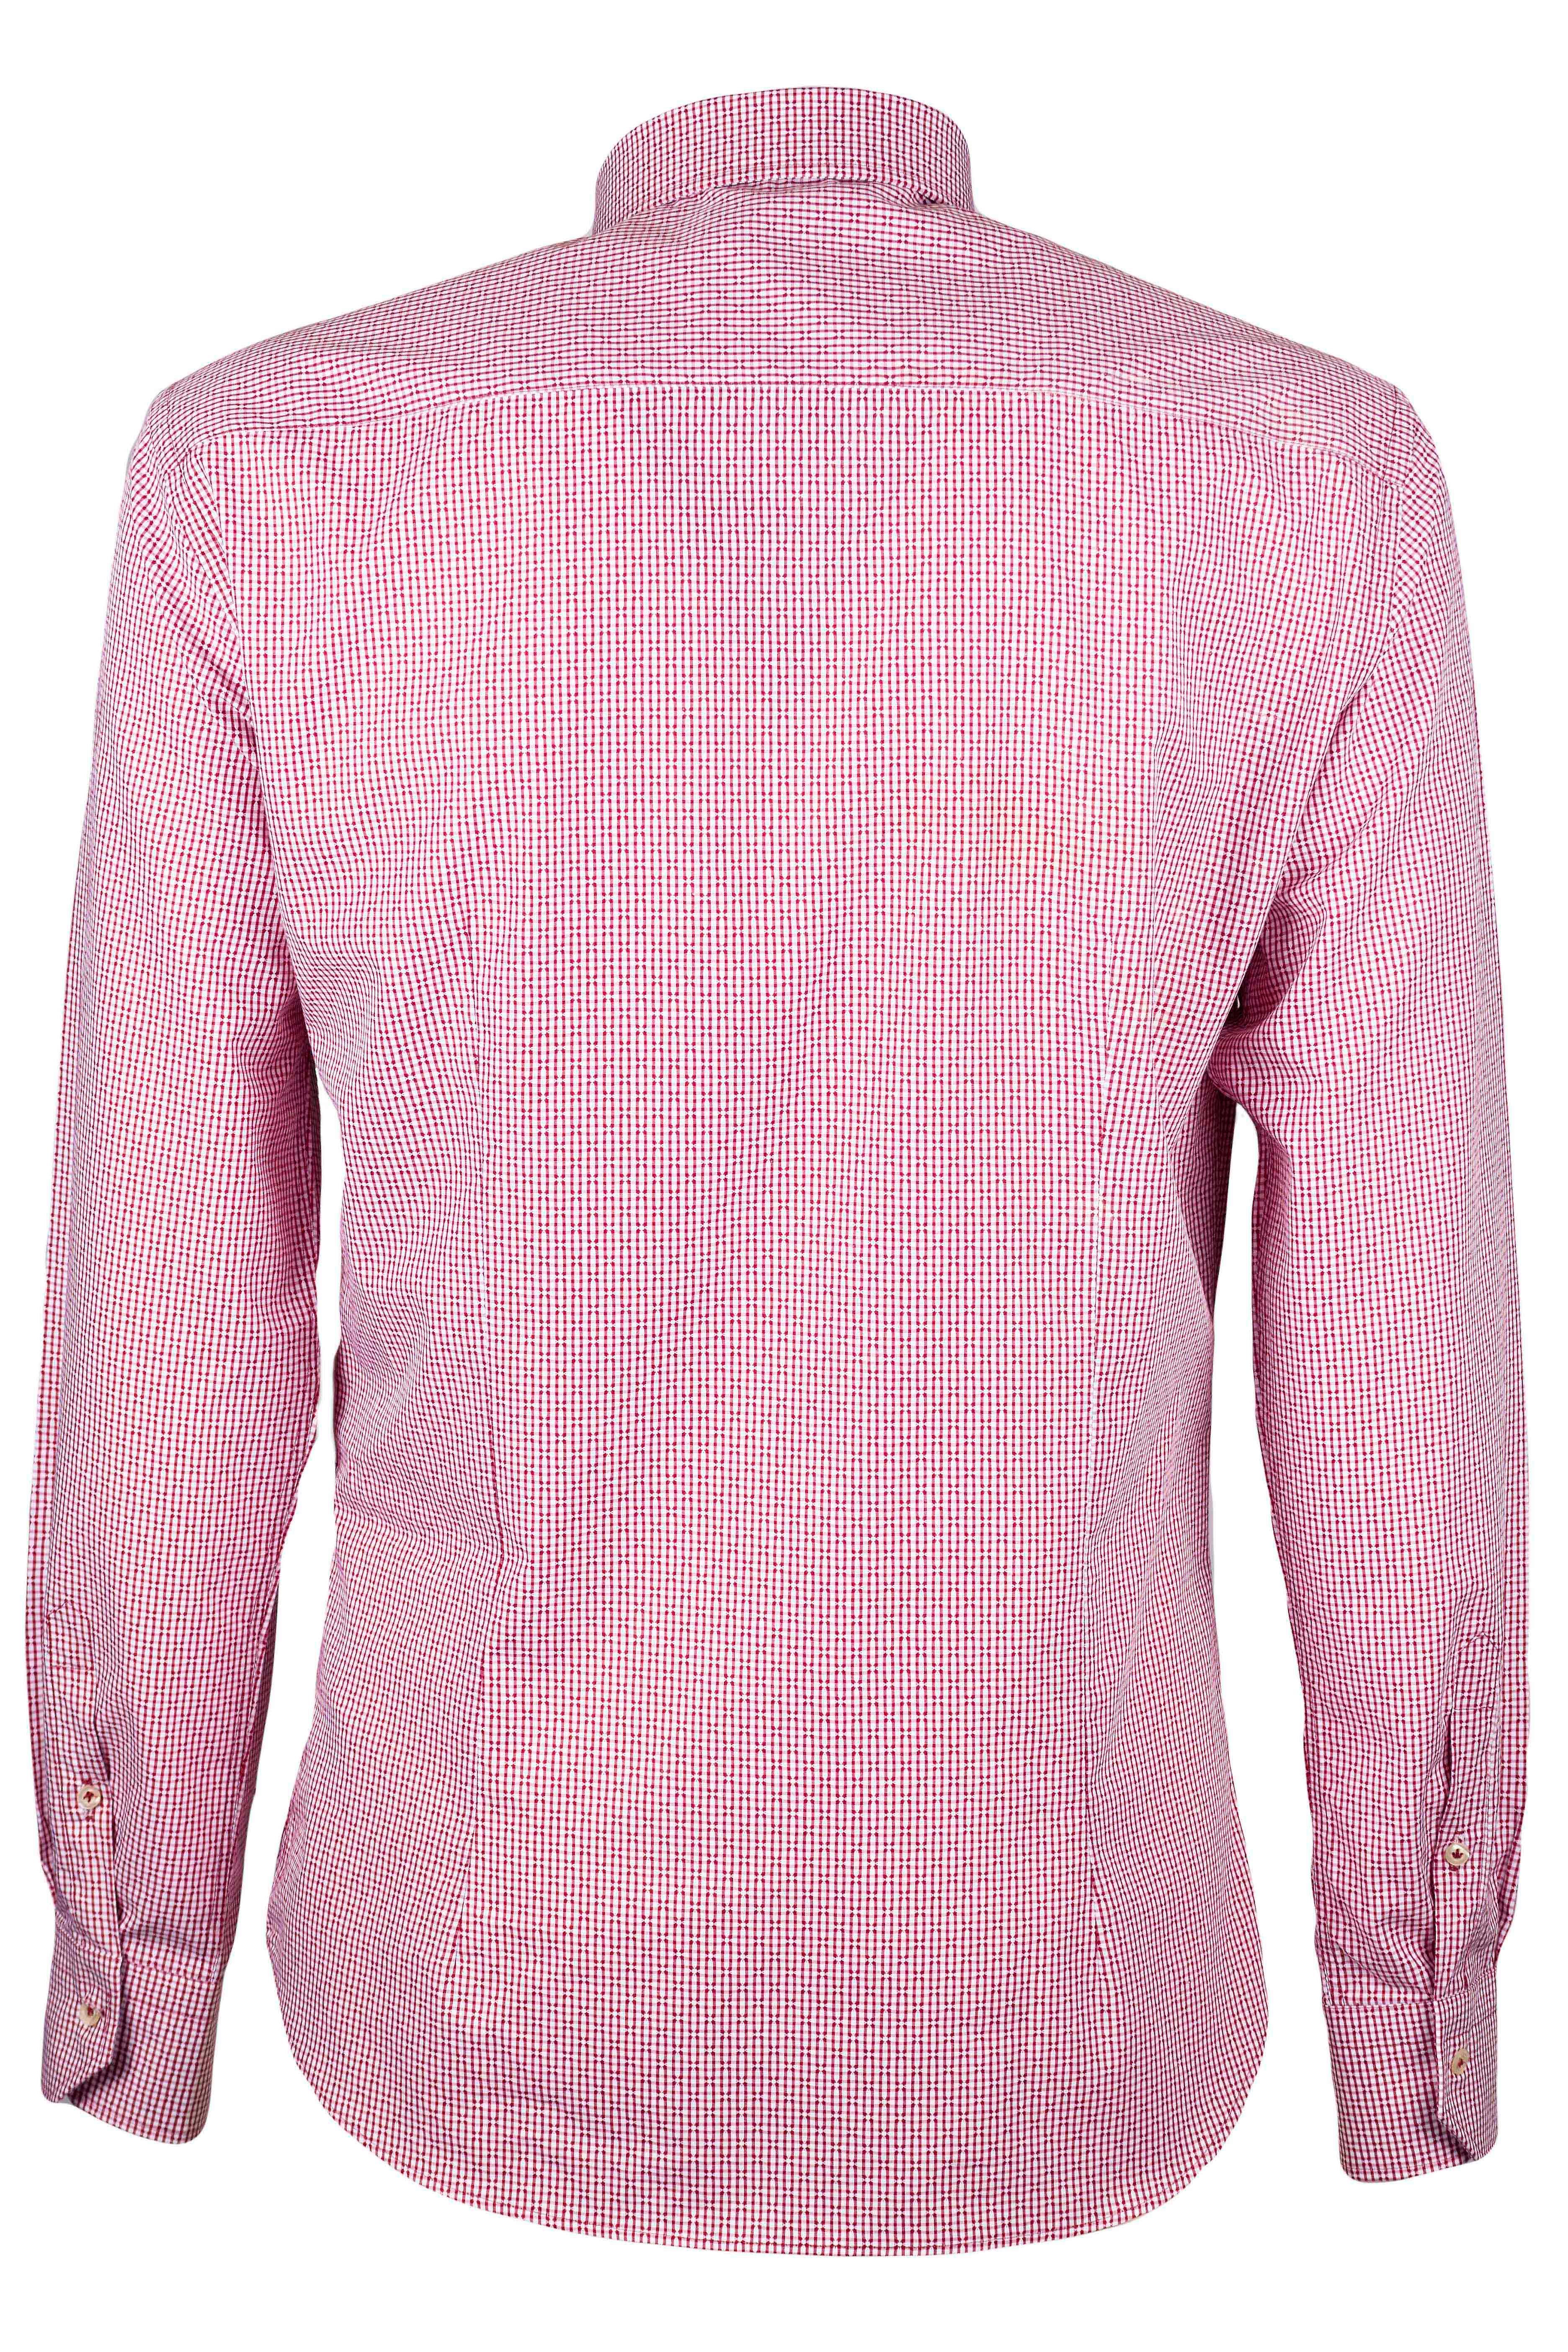 Fabio Giovanni Ginosa Shirt - Mens Italian Casual Stylish Shirt 100% Cotton - Long Sleeve